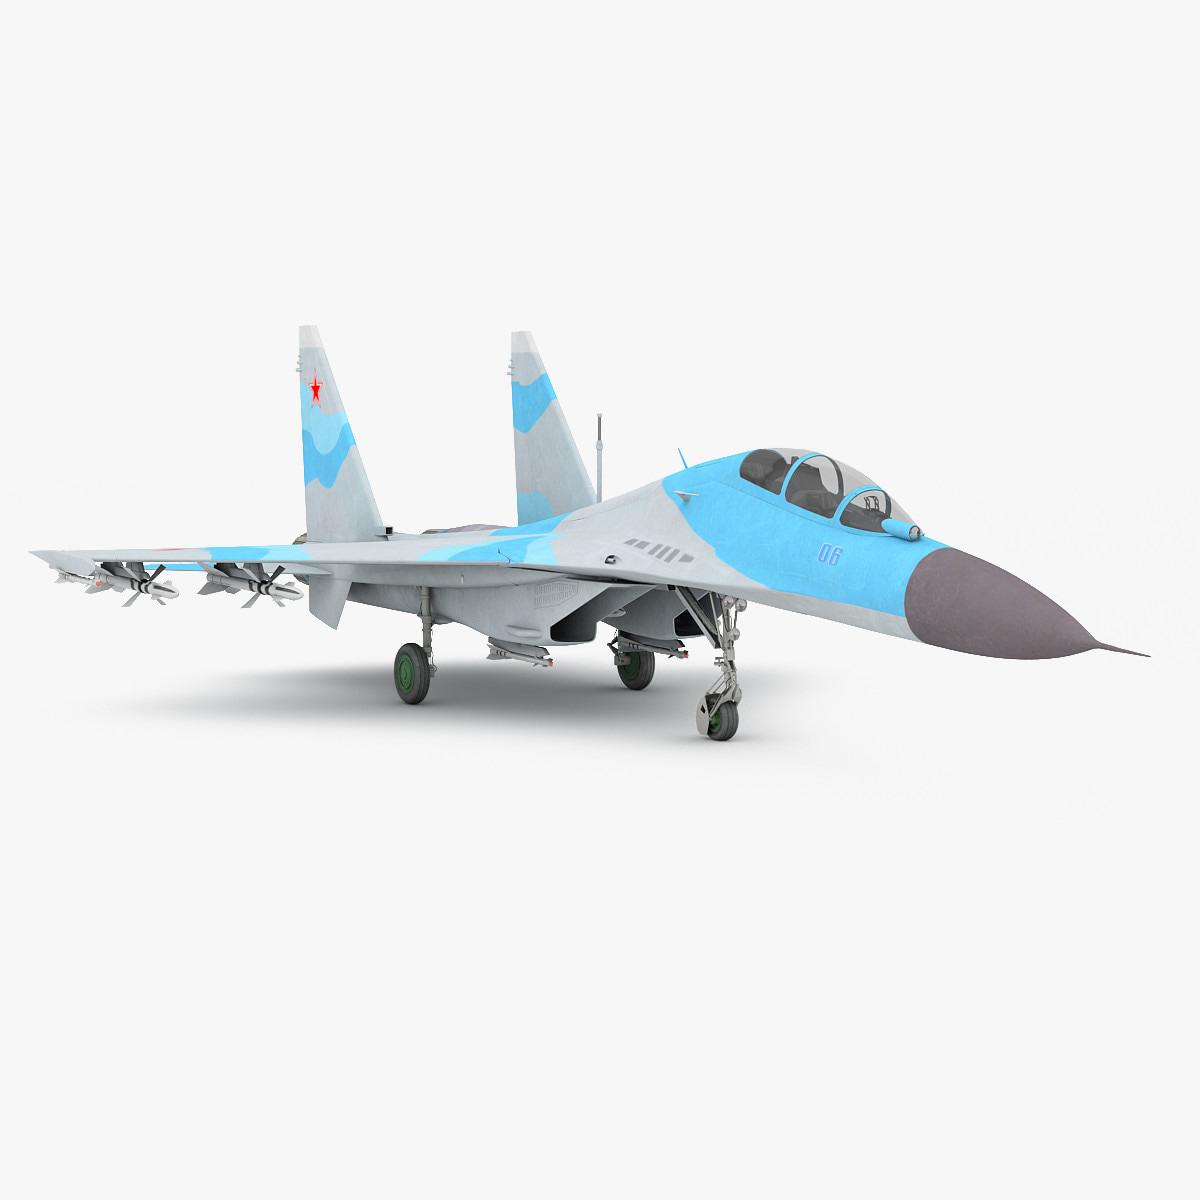 Russian_Fighter_Aircraft_Sukhoi_Su30_v1_Static_000.jpge756de31-bc5e-46d6-b909-6da83c3268e0Original.jpg